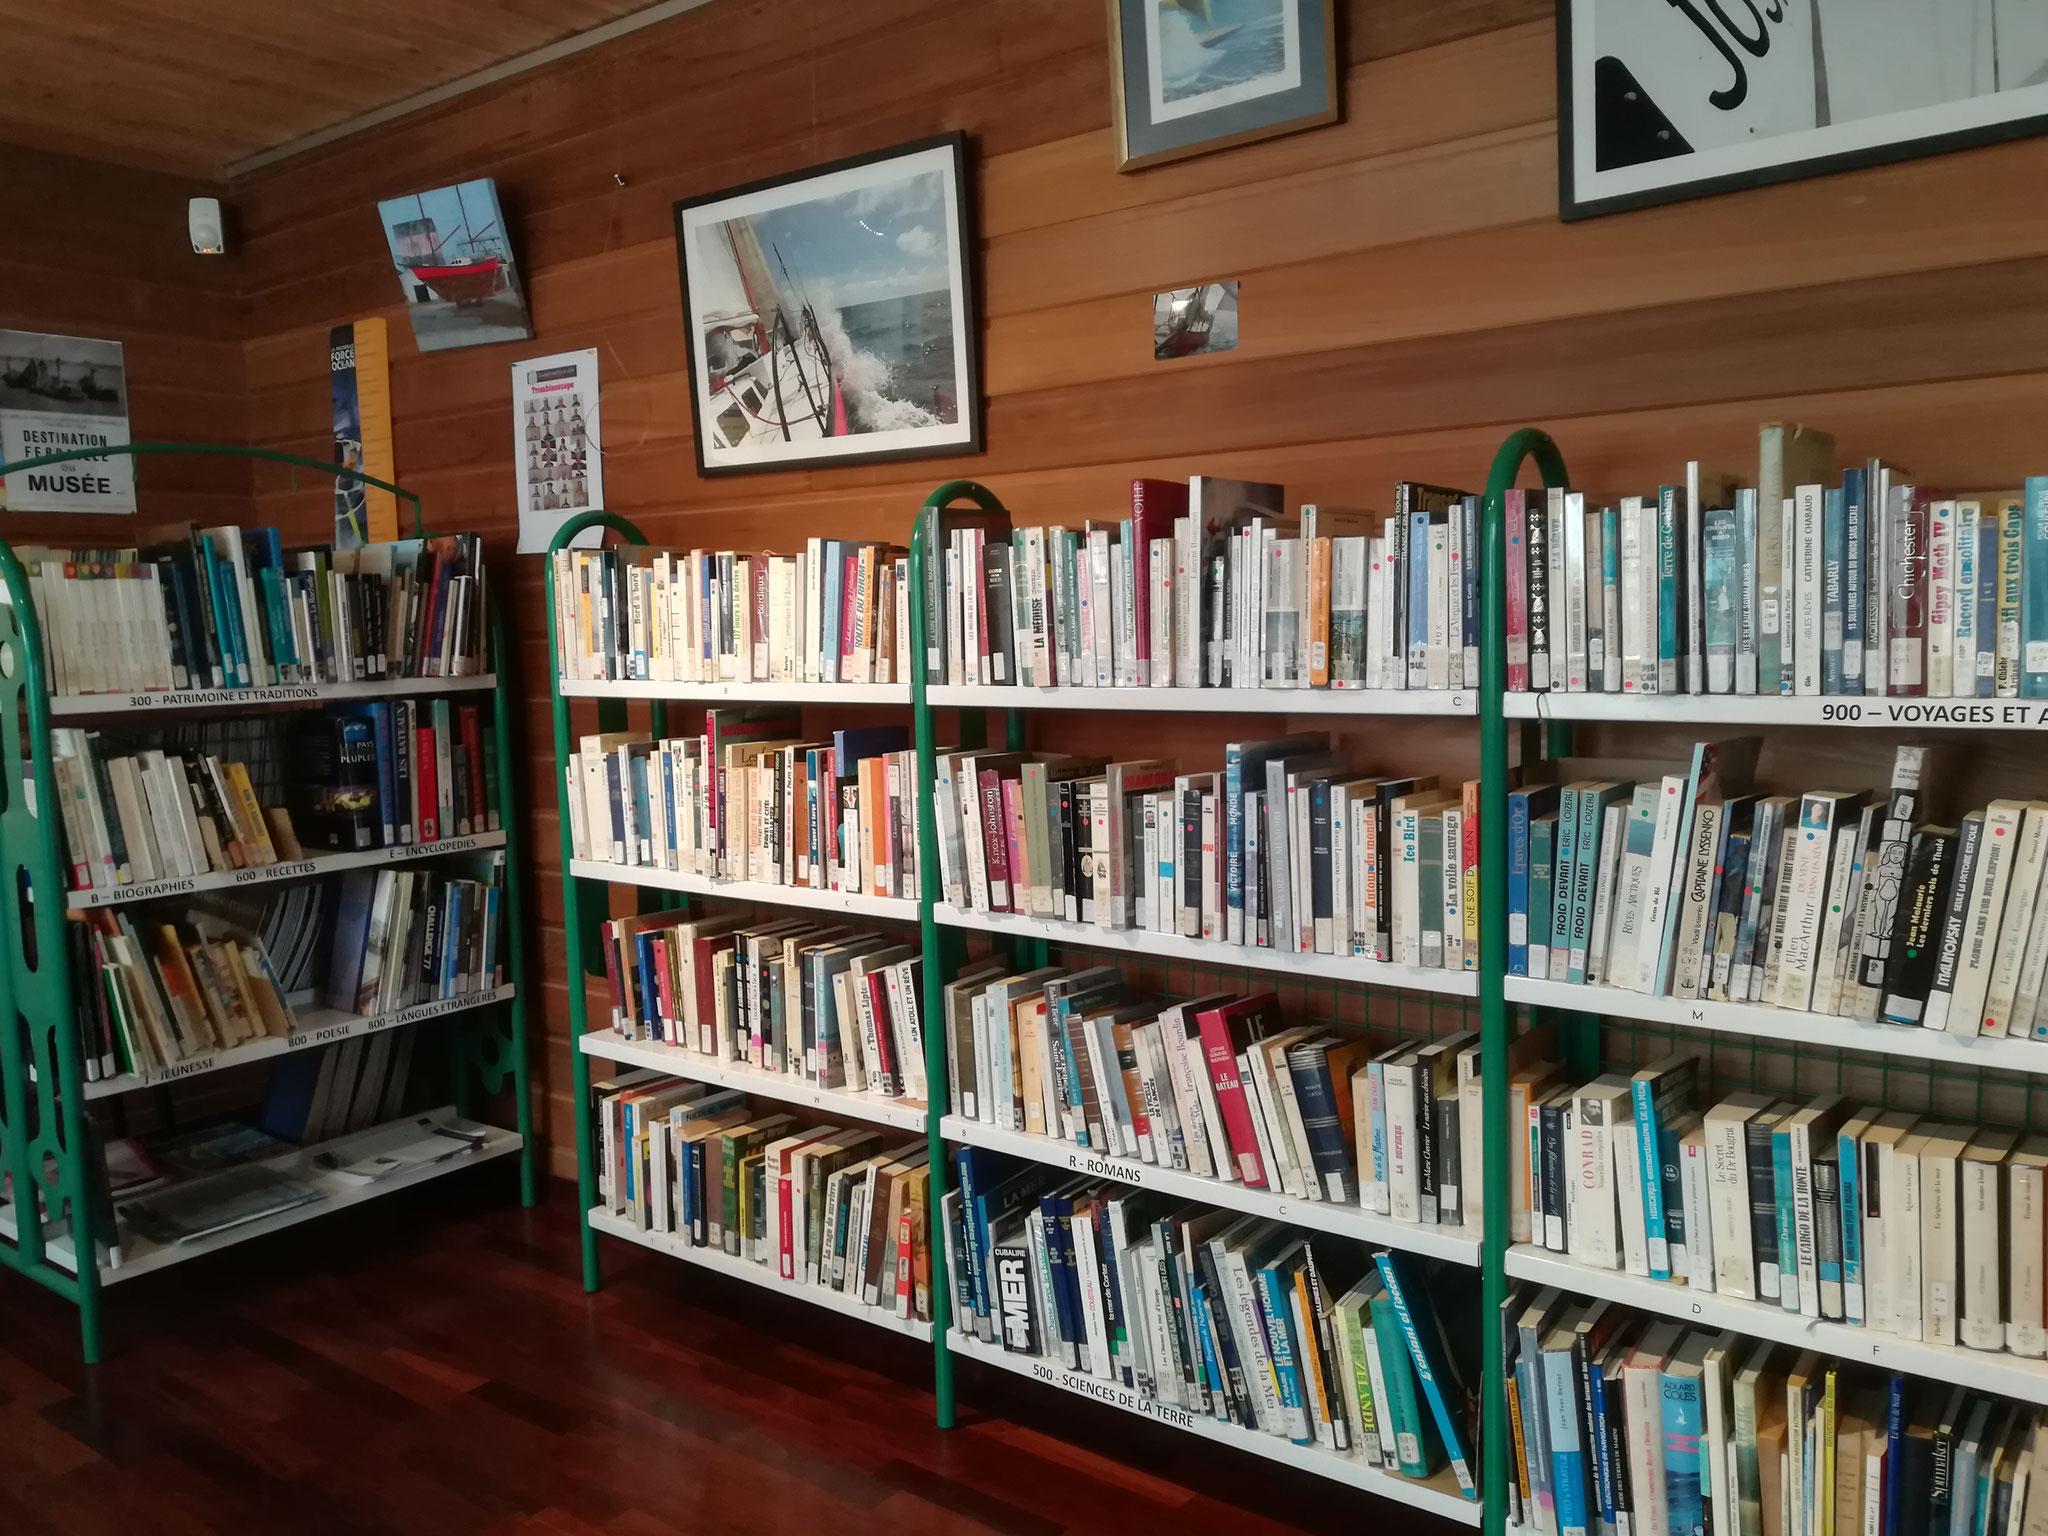 La bibliothèque maritime